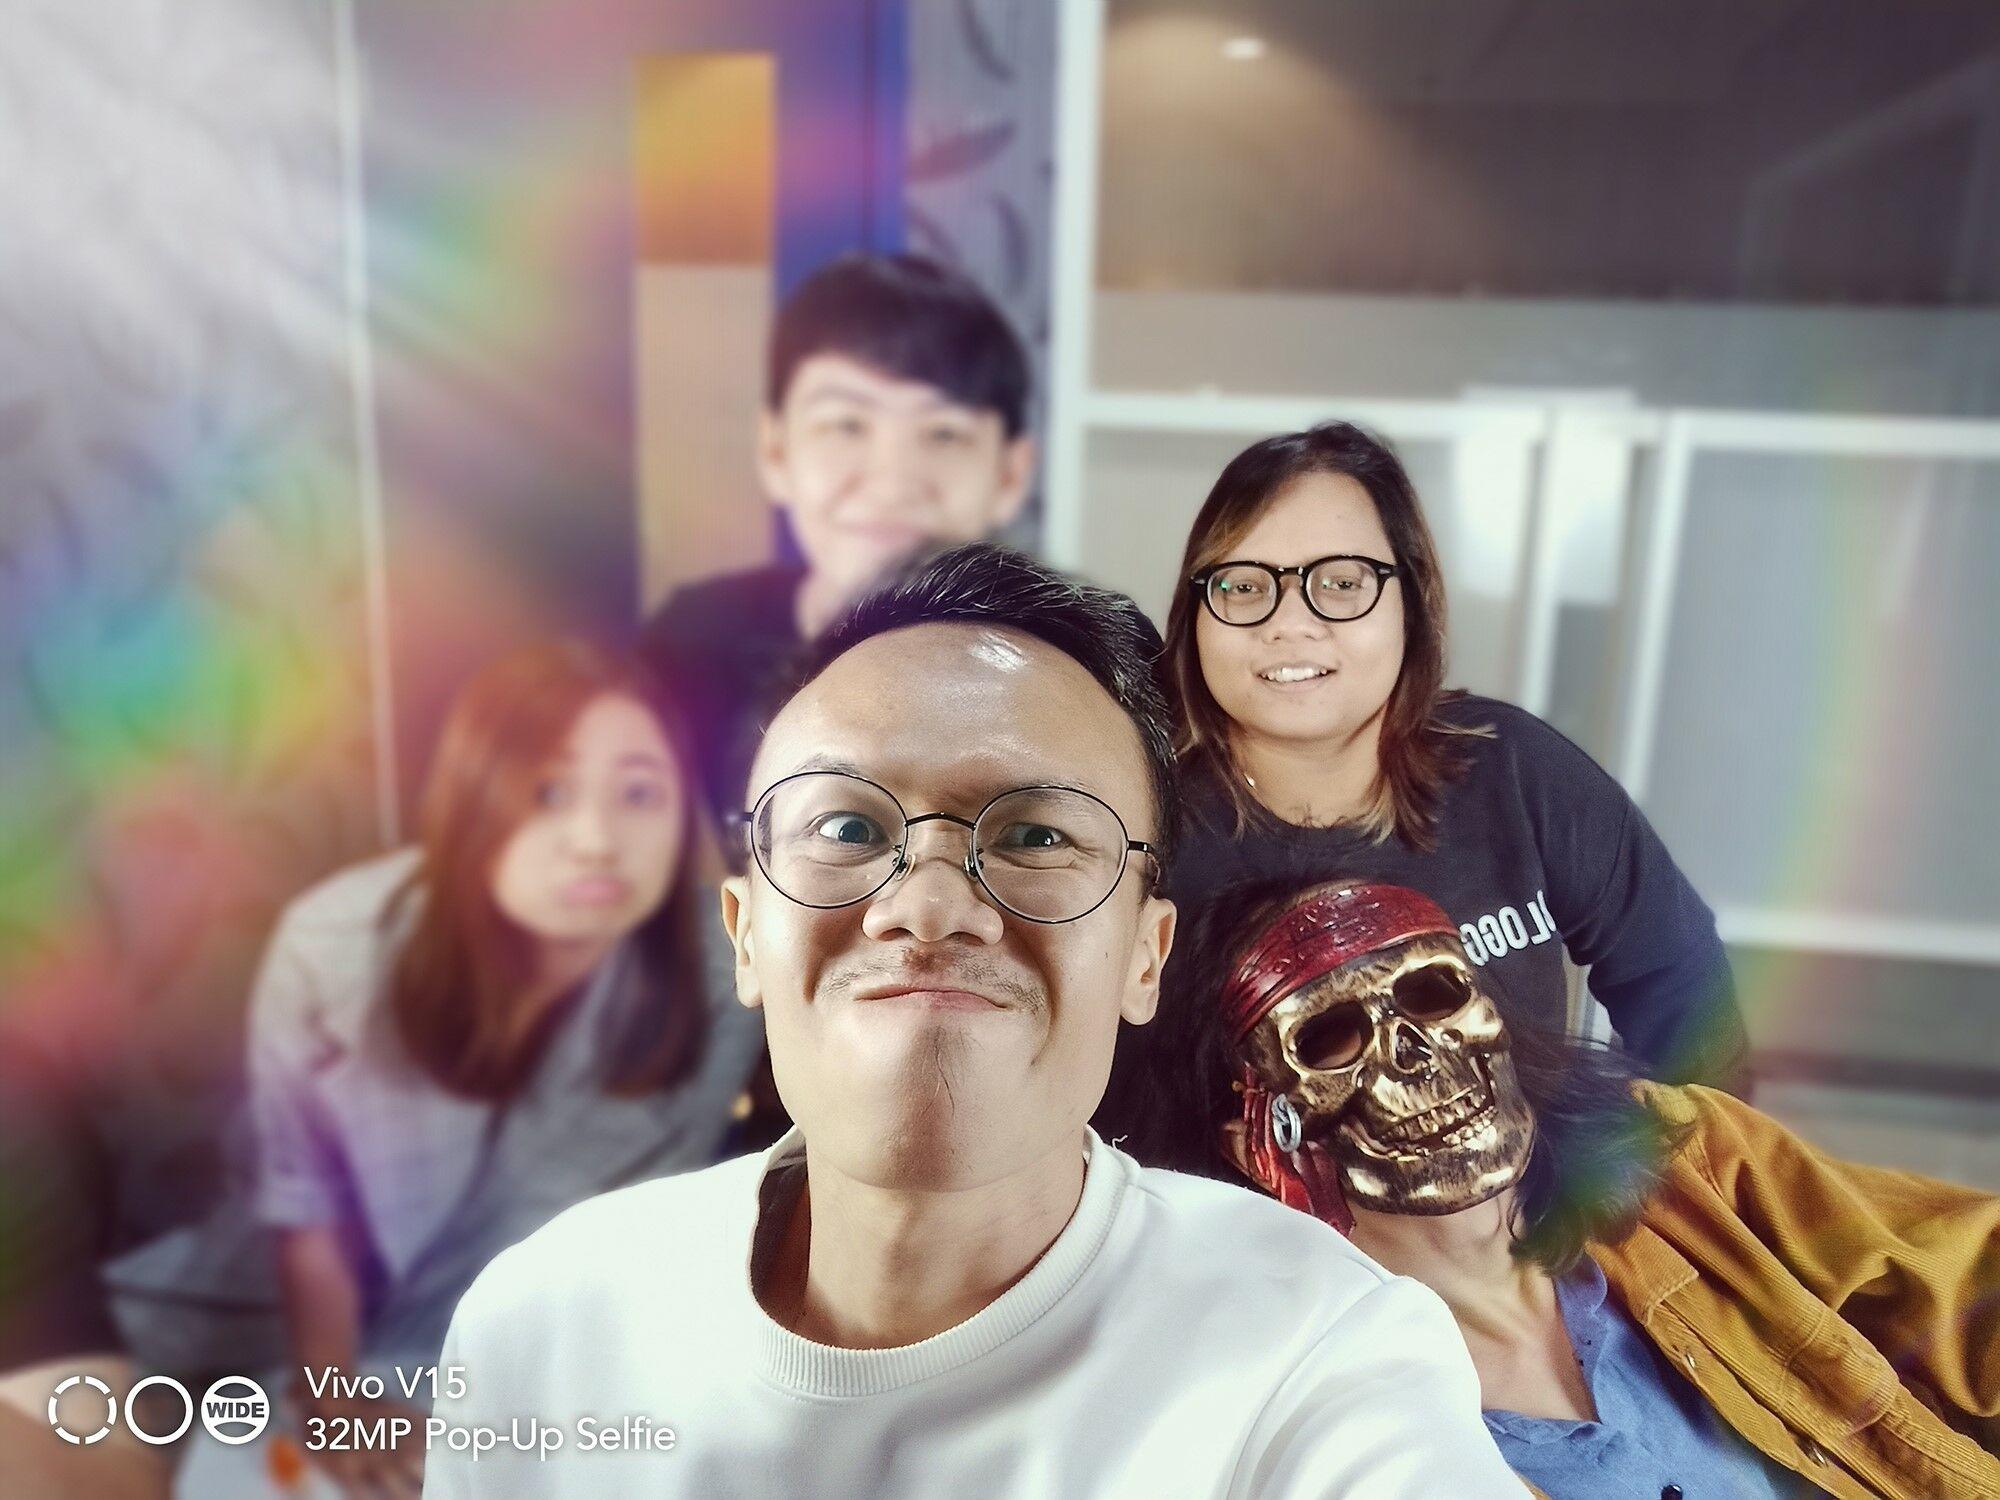 Foto Selfie Vivo V15 02 24d5e